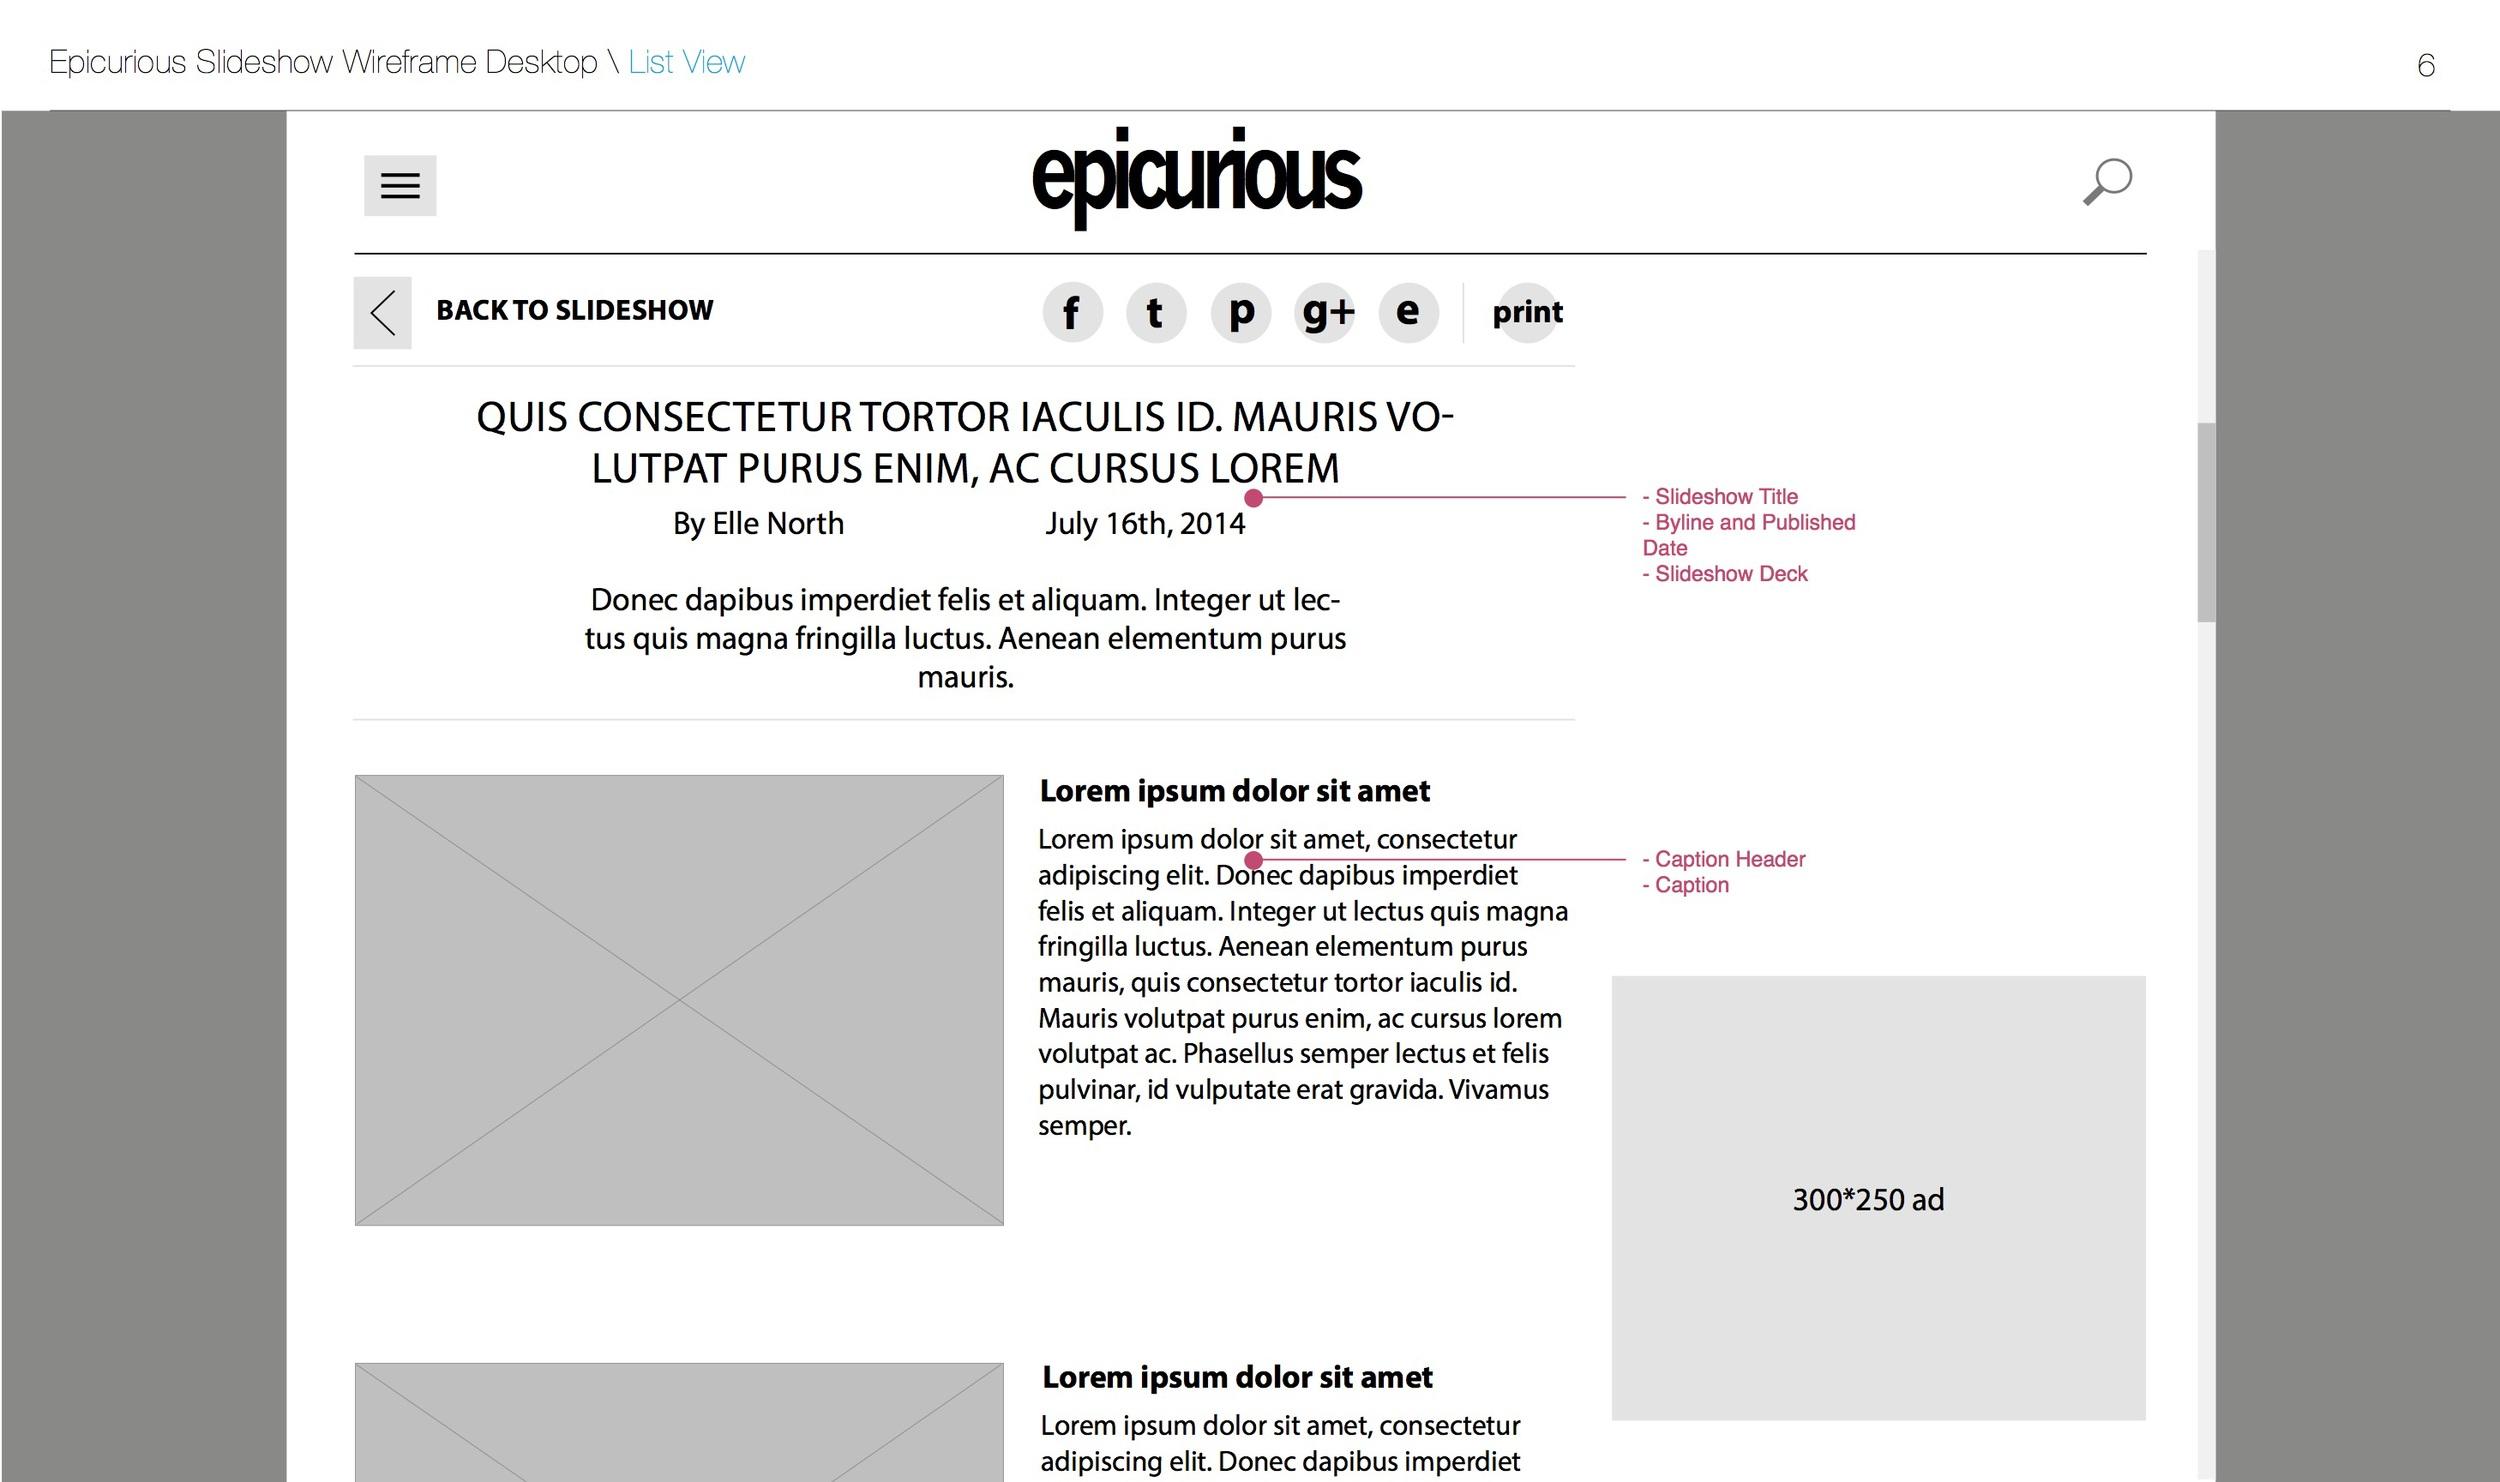 Epi_Slideshow_Wires_V4_4.jpg